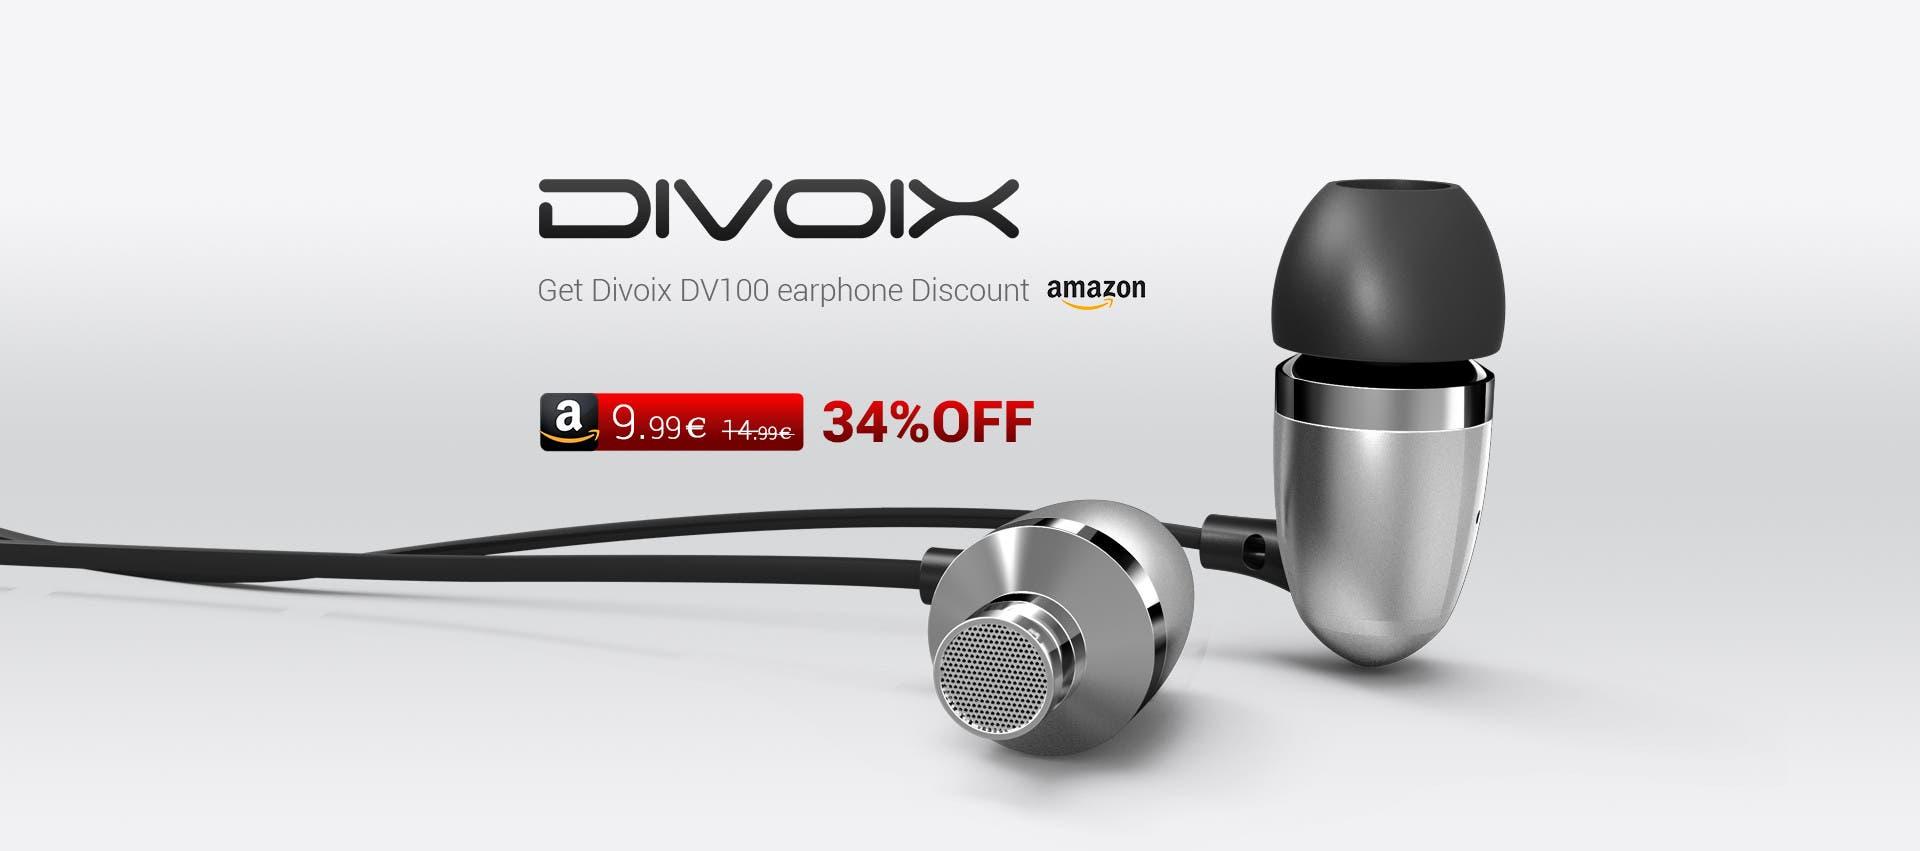 umi divoix dv100 earphone